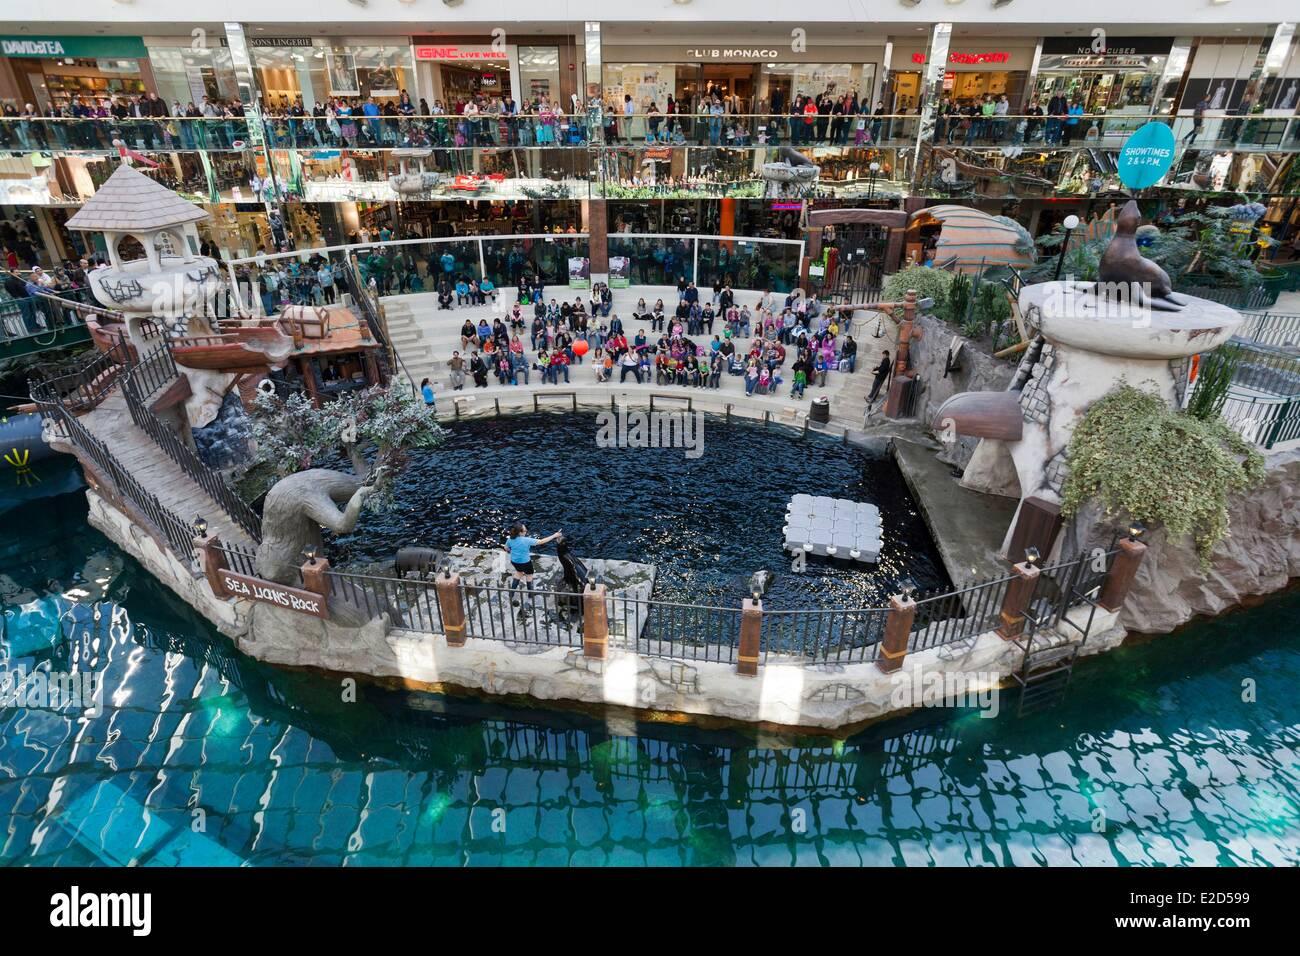 Kanada Alberta Edmonton West Edmonton Mall das größte Einkaufszentrum in Kanada Sea Lion Rock show mit Stockbild